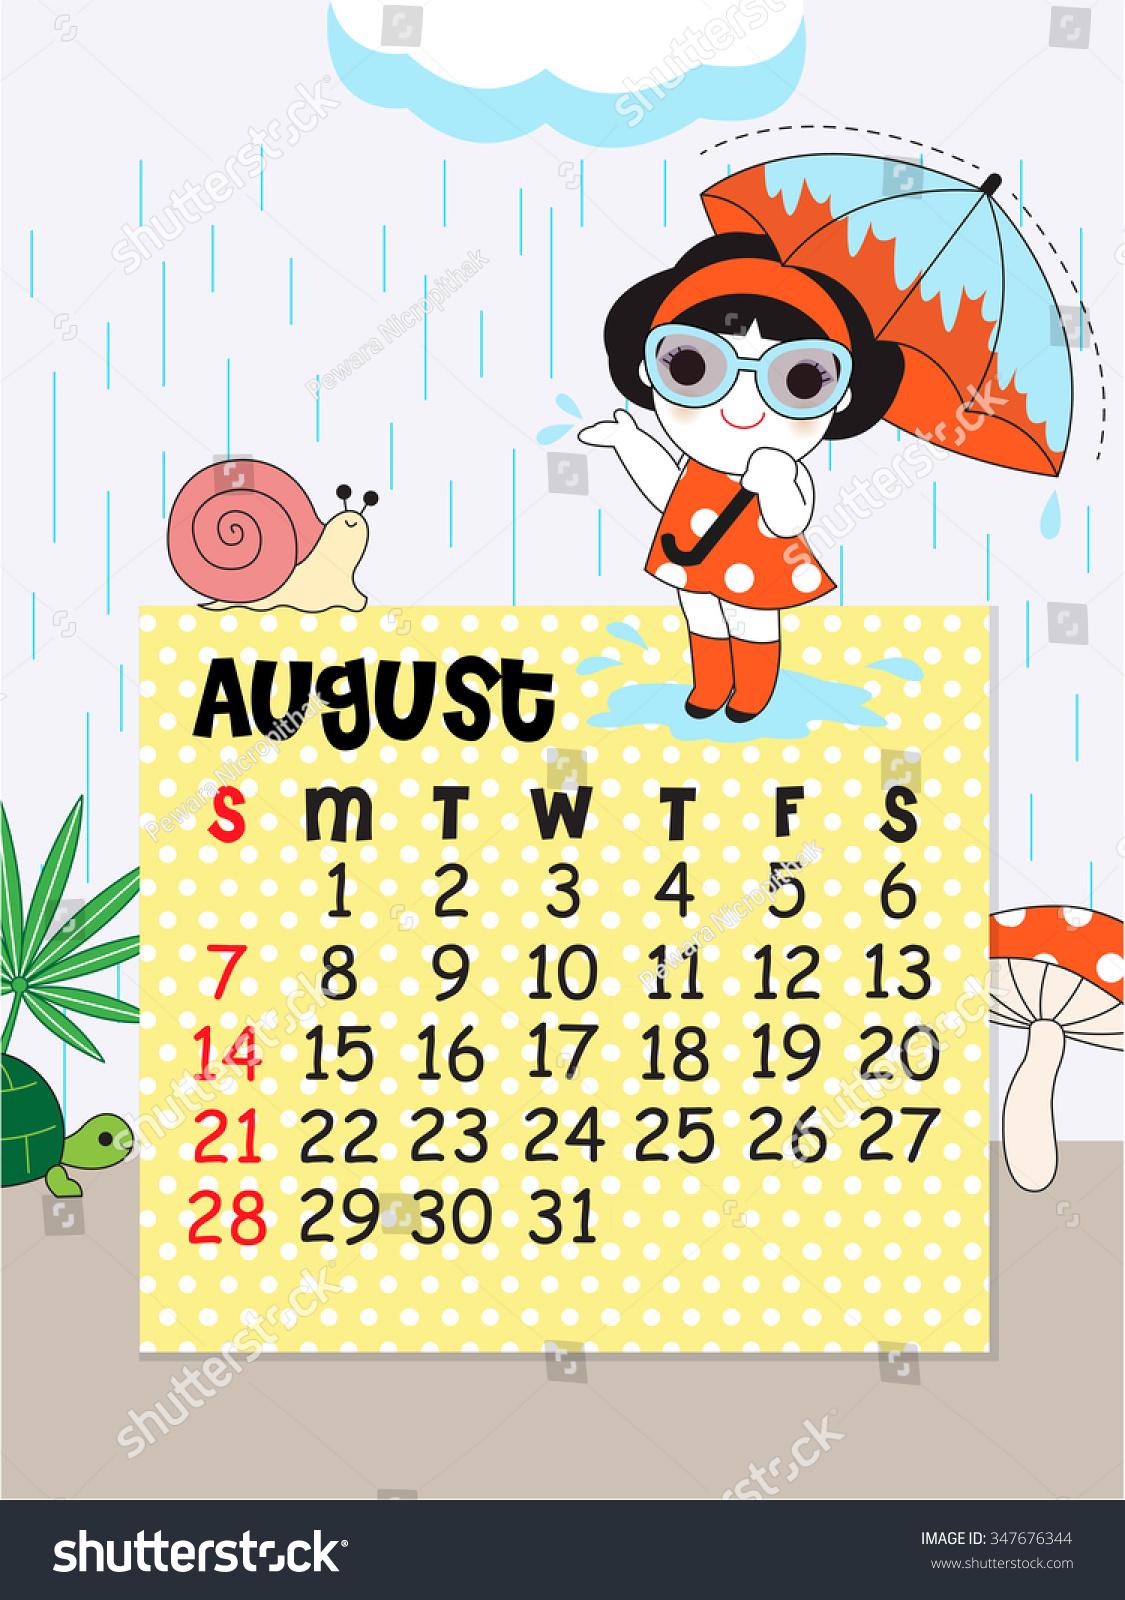 Cute Calendar Illustration : August calendar template cute character illustration